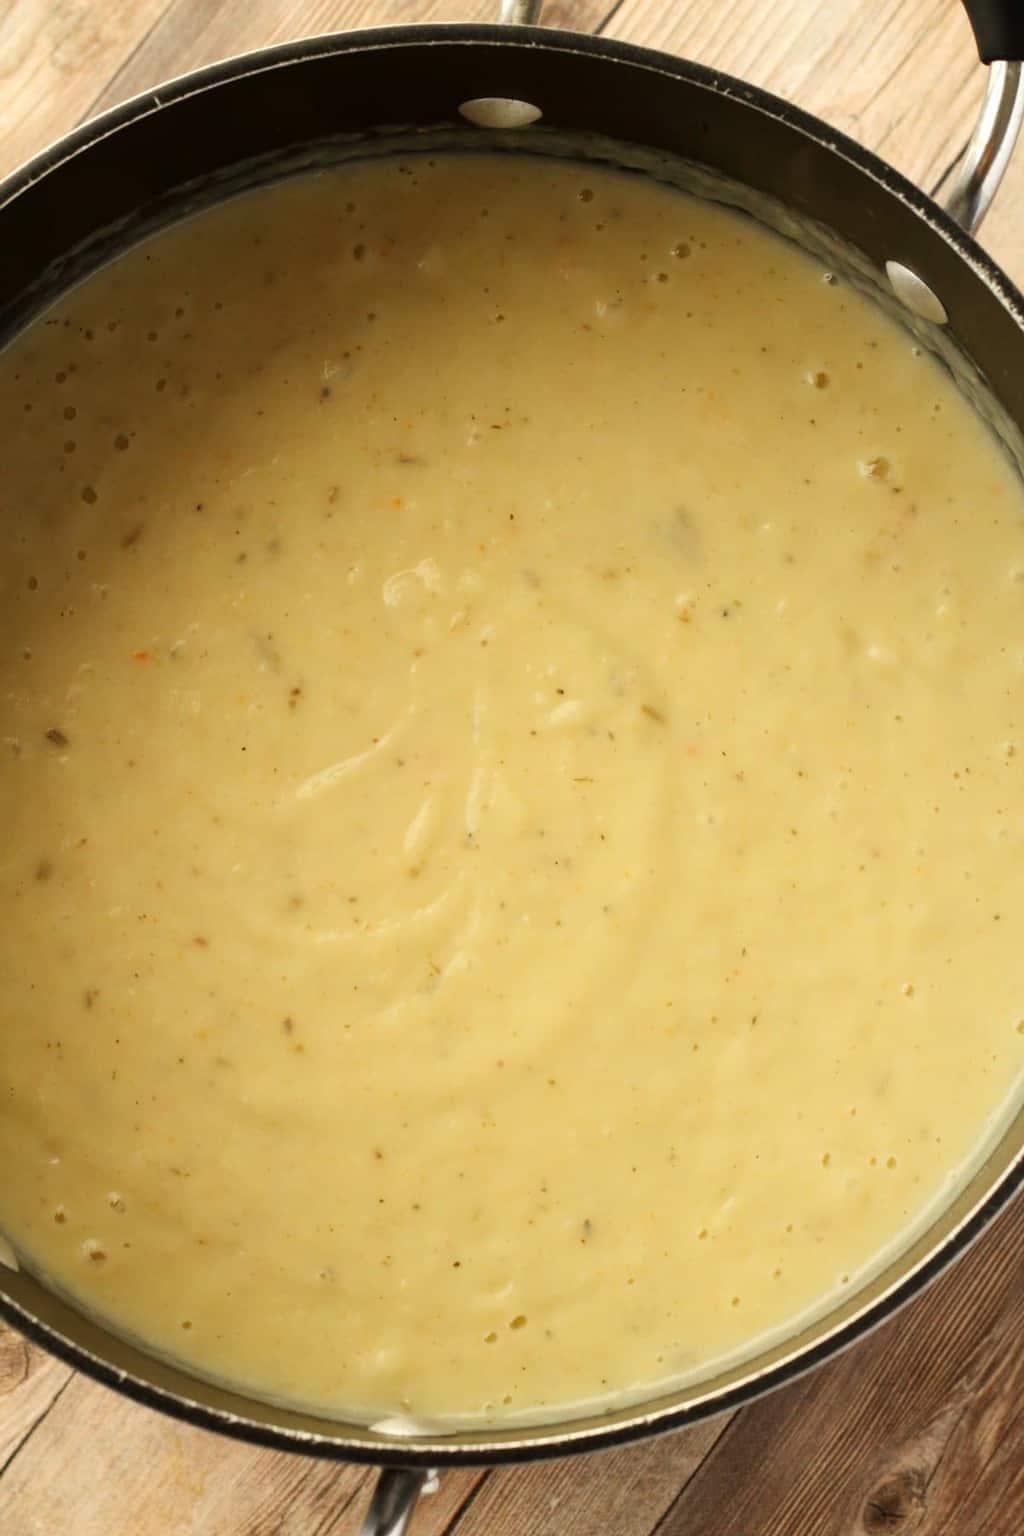 Vegan Potato Leek Soup freshly blended up in a pot.